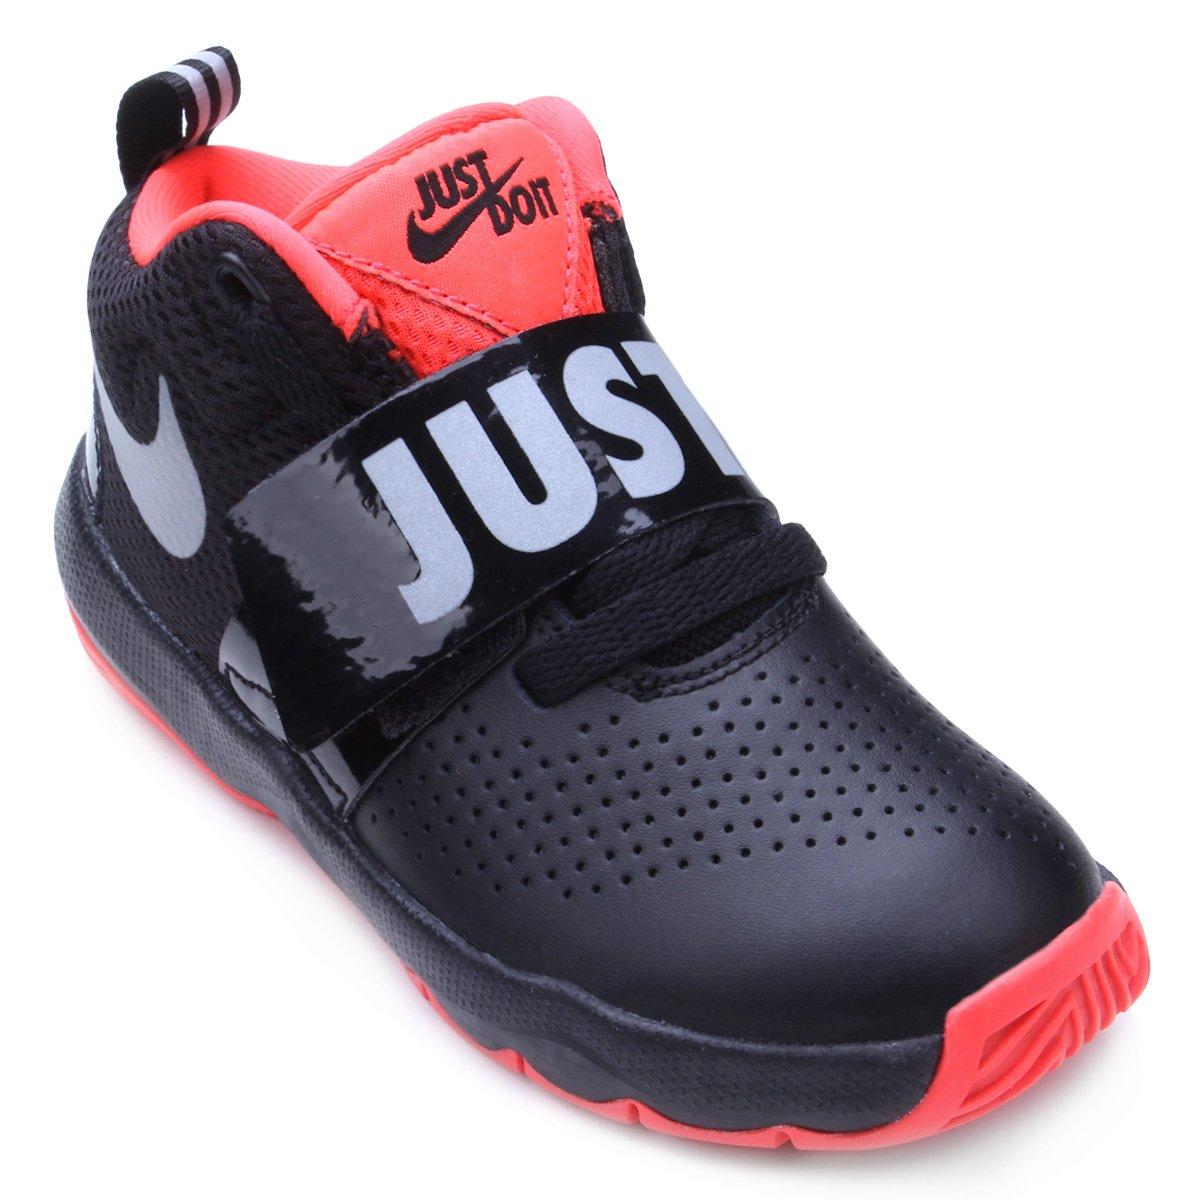 76fa65d1d0ff0 Tênis Infantil Nike Team Hustle Masculino - Preto e Prata - Compre Agora